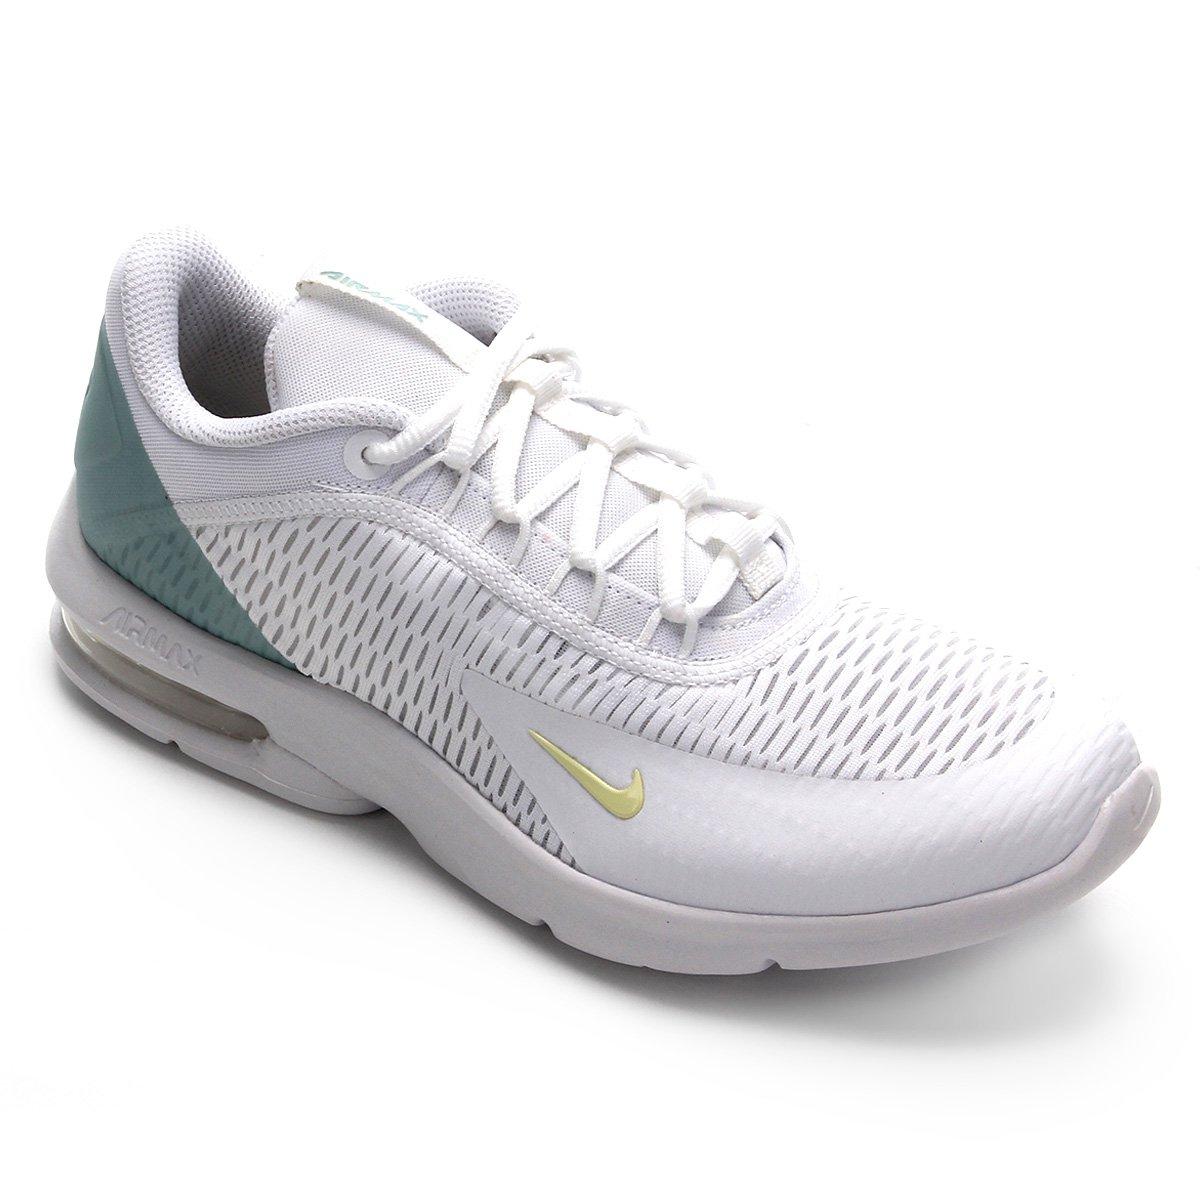 Tênis Nike Air Max Advantage 3 Feminino Branco E Verde